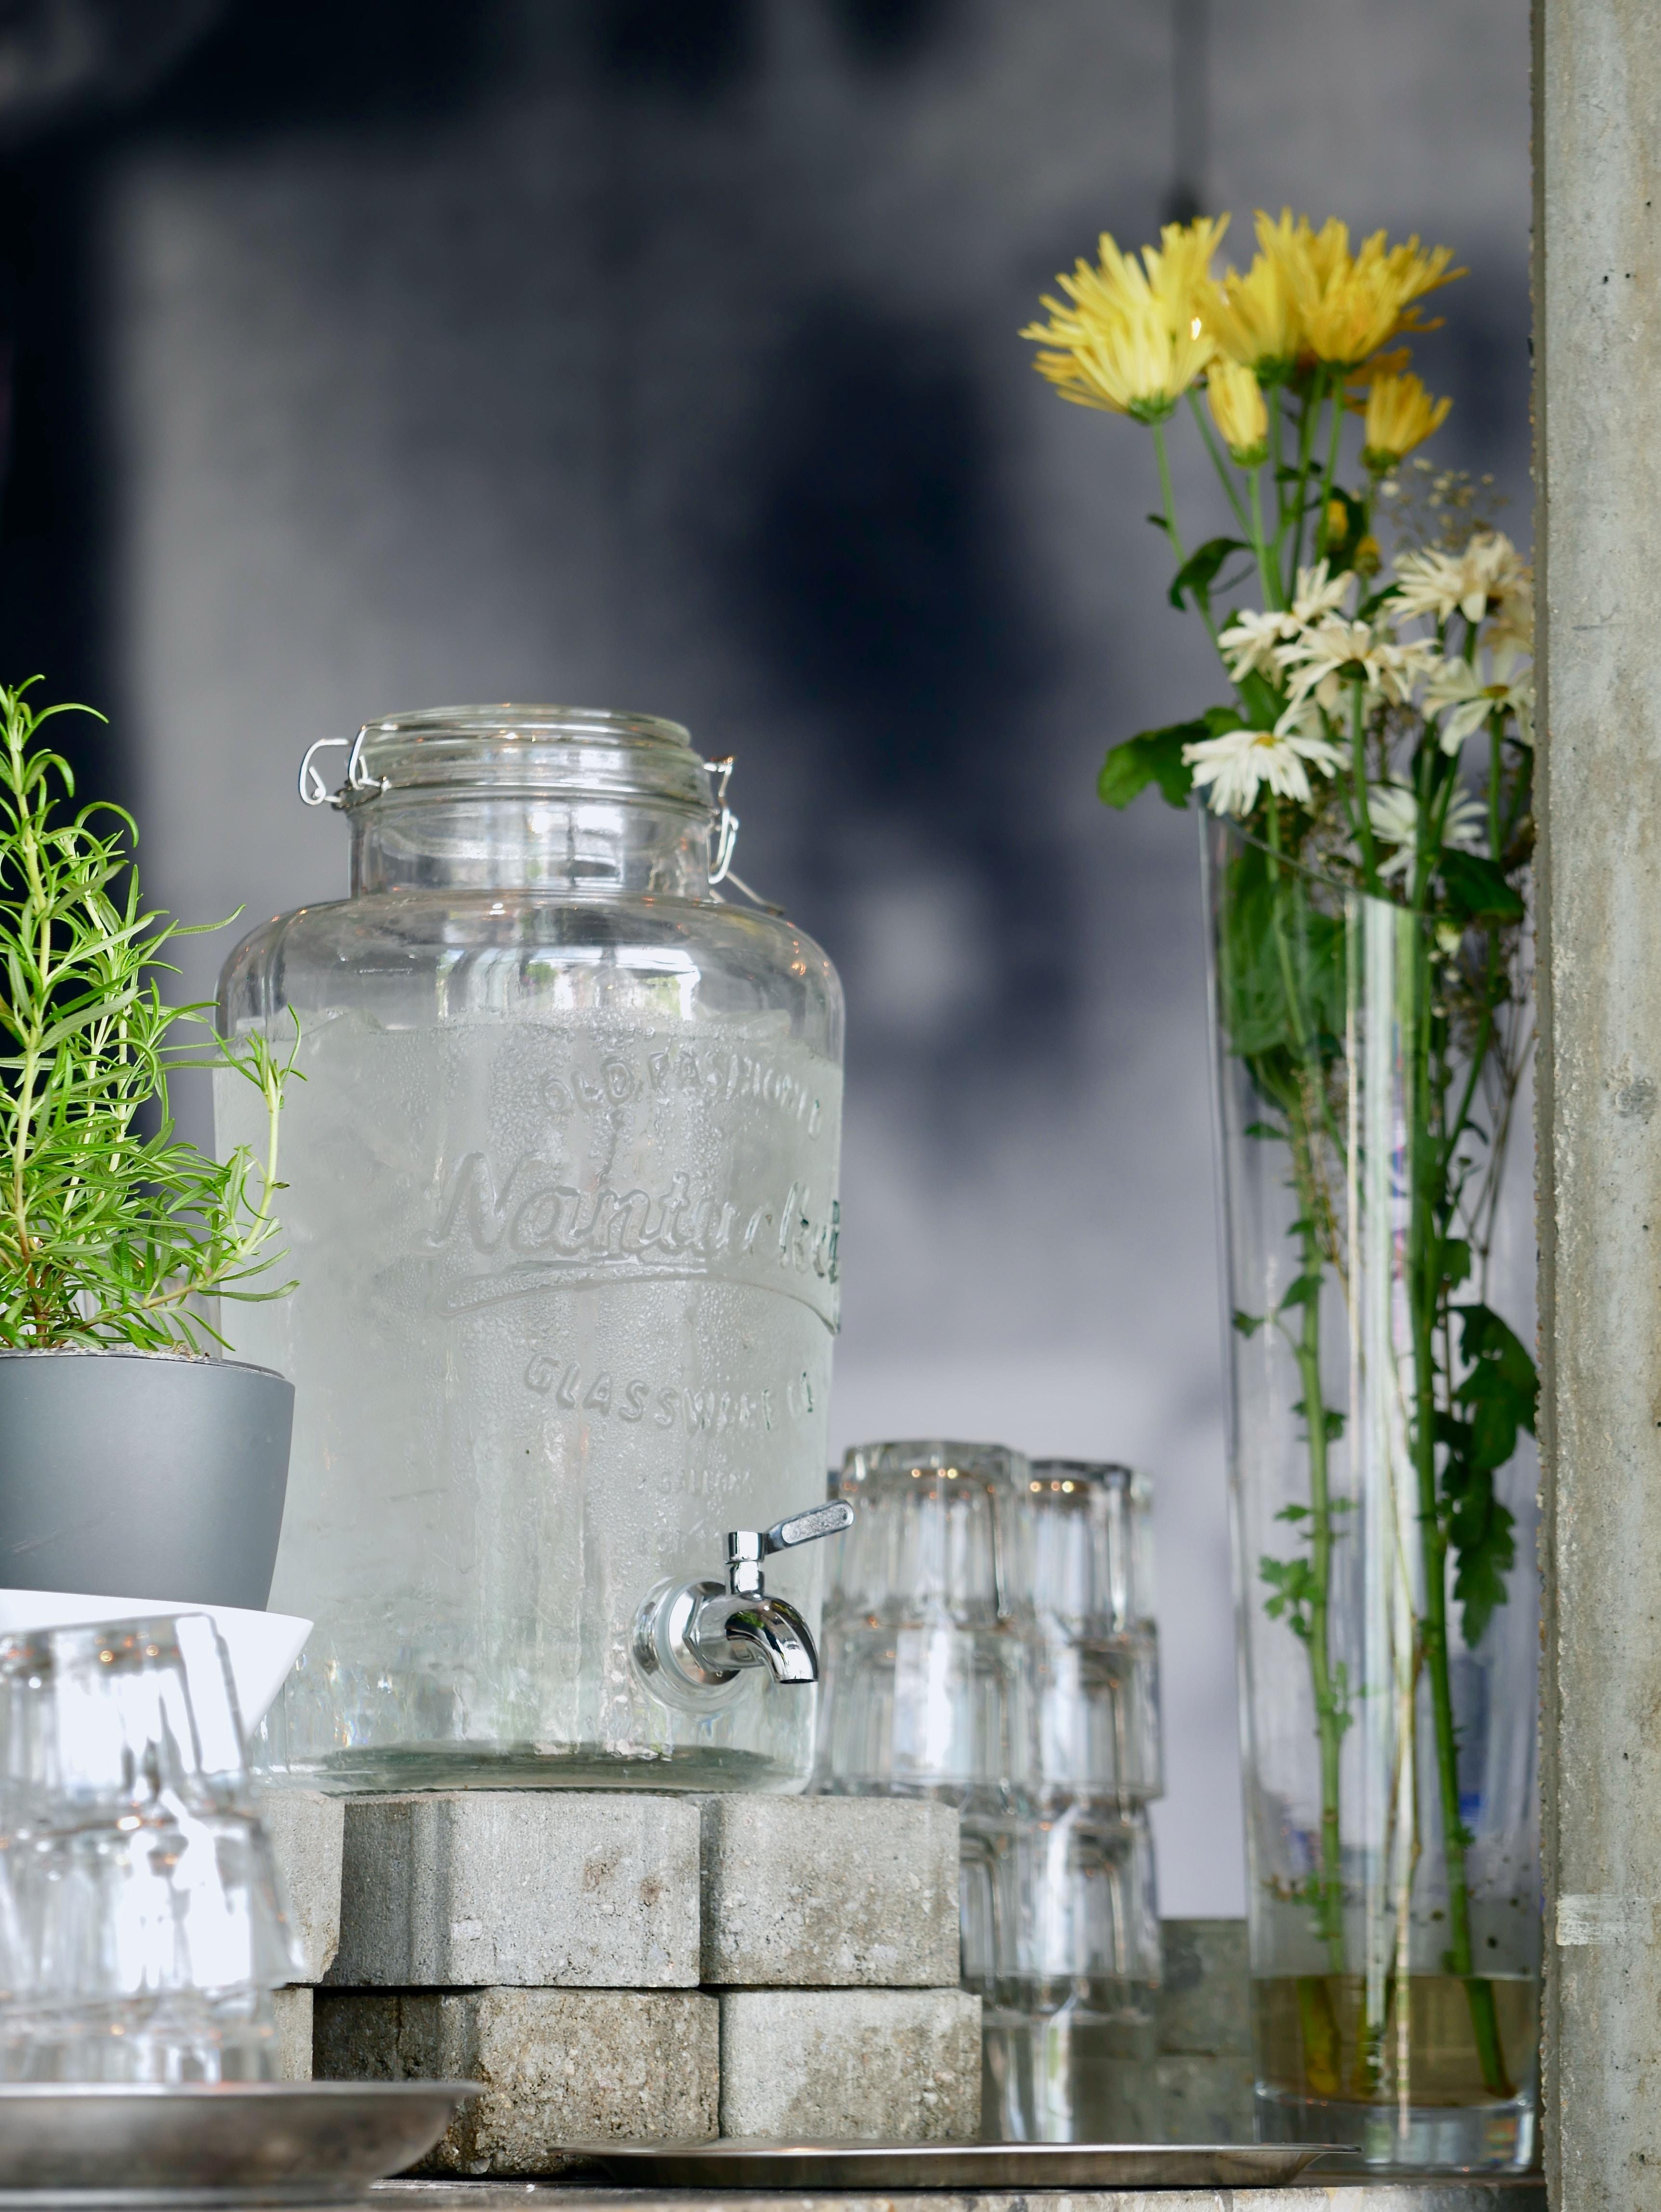 clear glass beverage dispenser beside green leafed plant